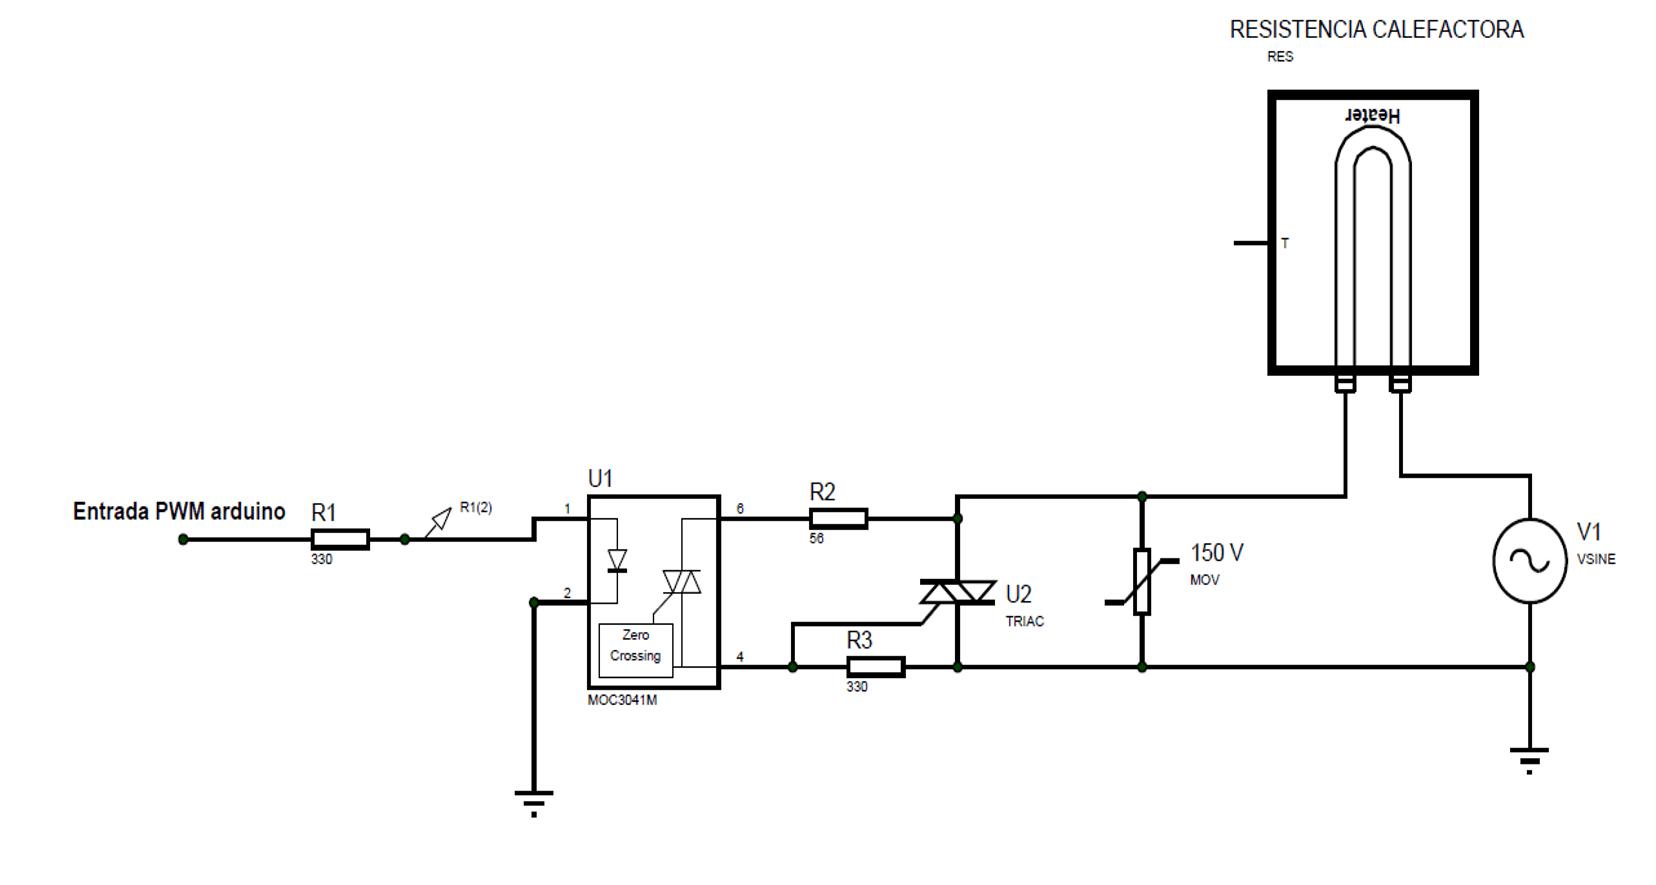 dual immersion switch wiring diagram trailer 7 pin heater facias